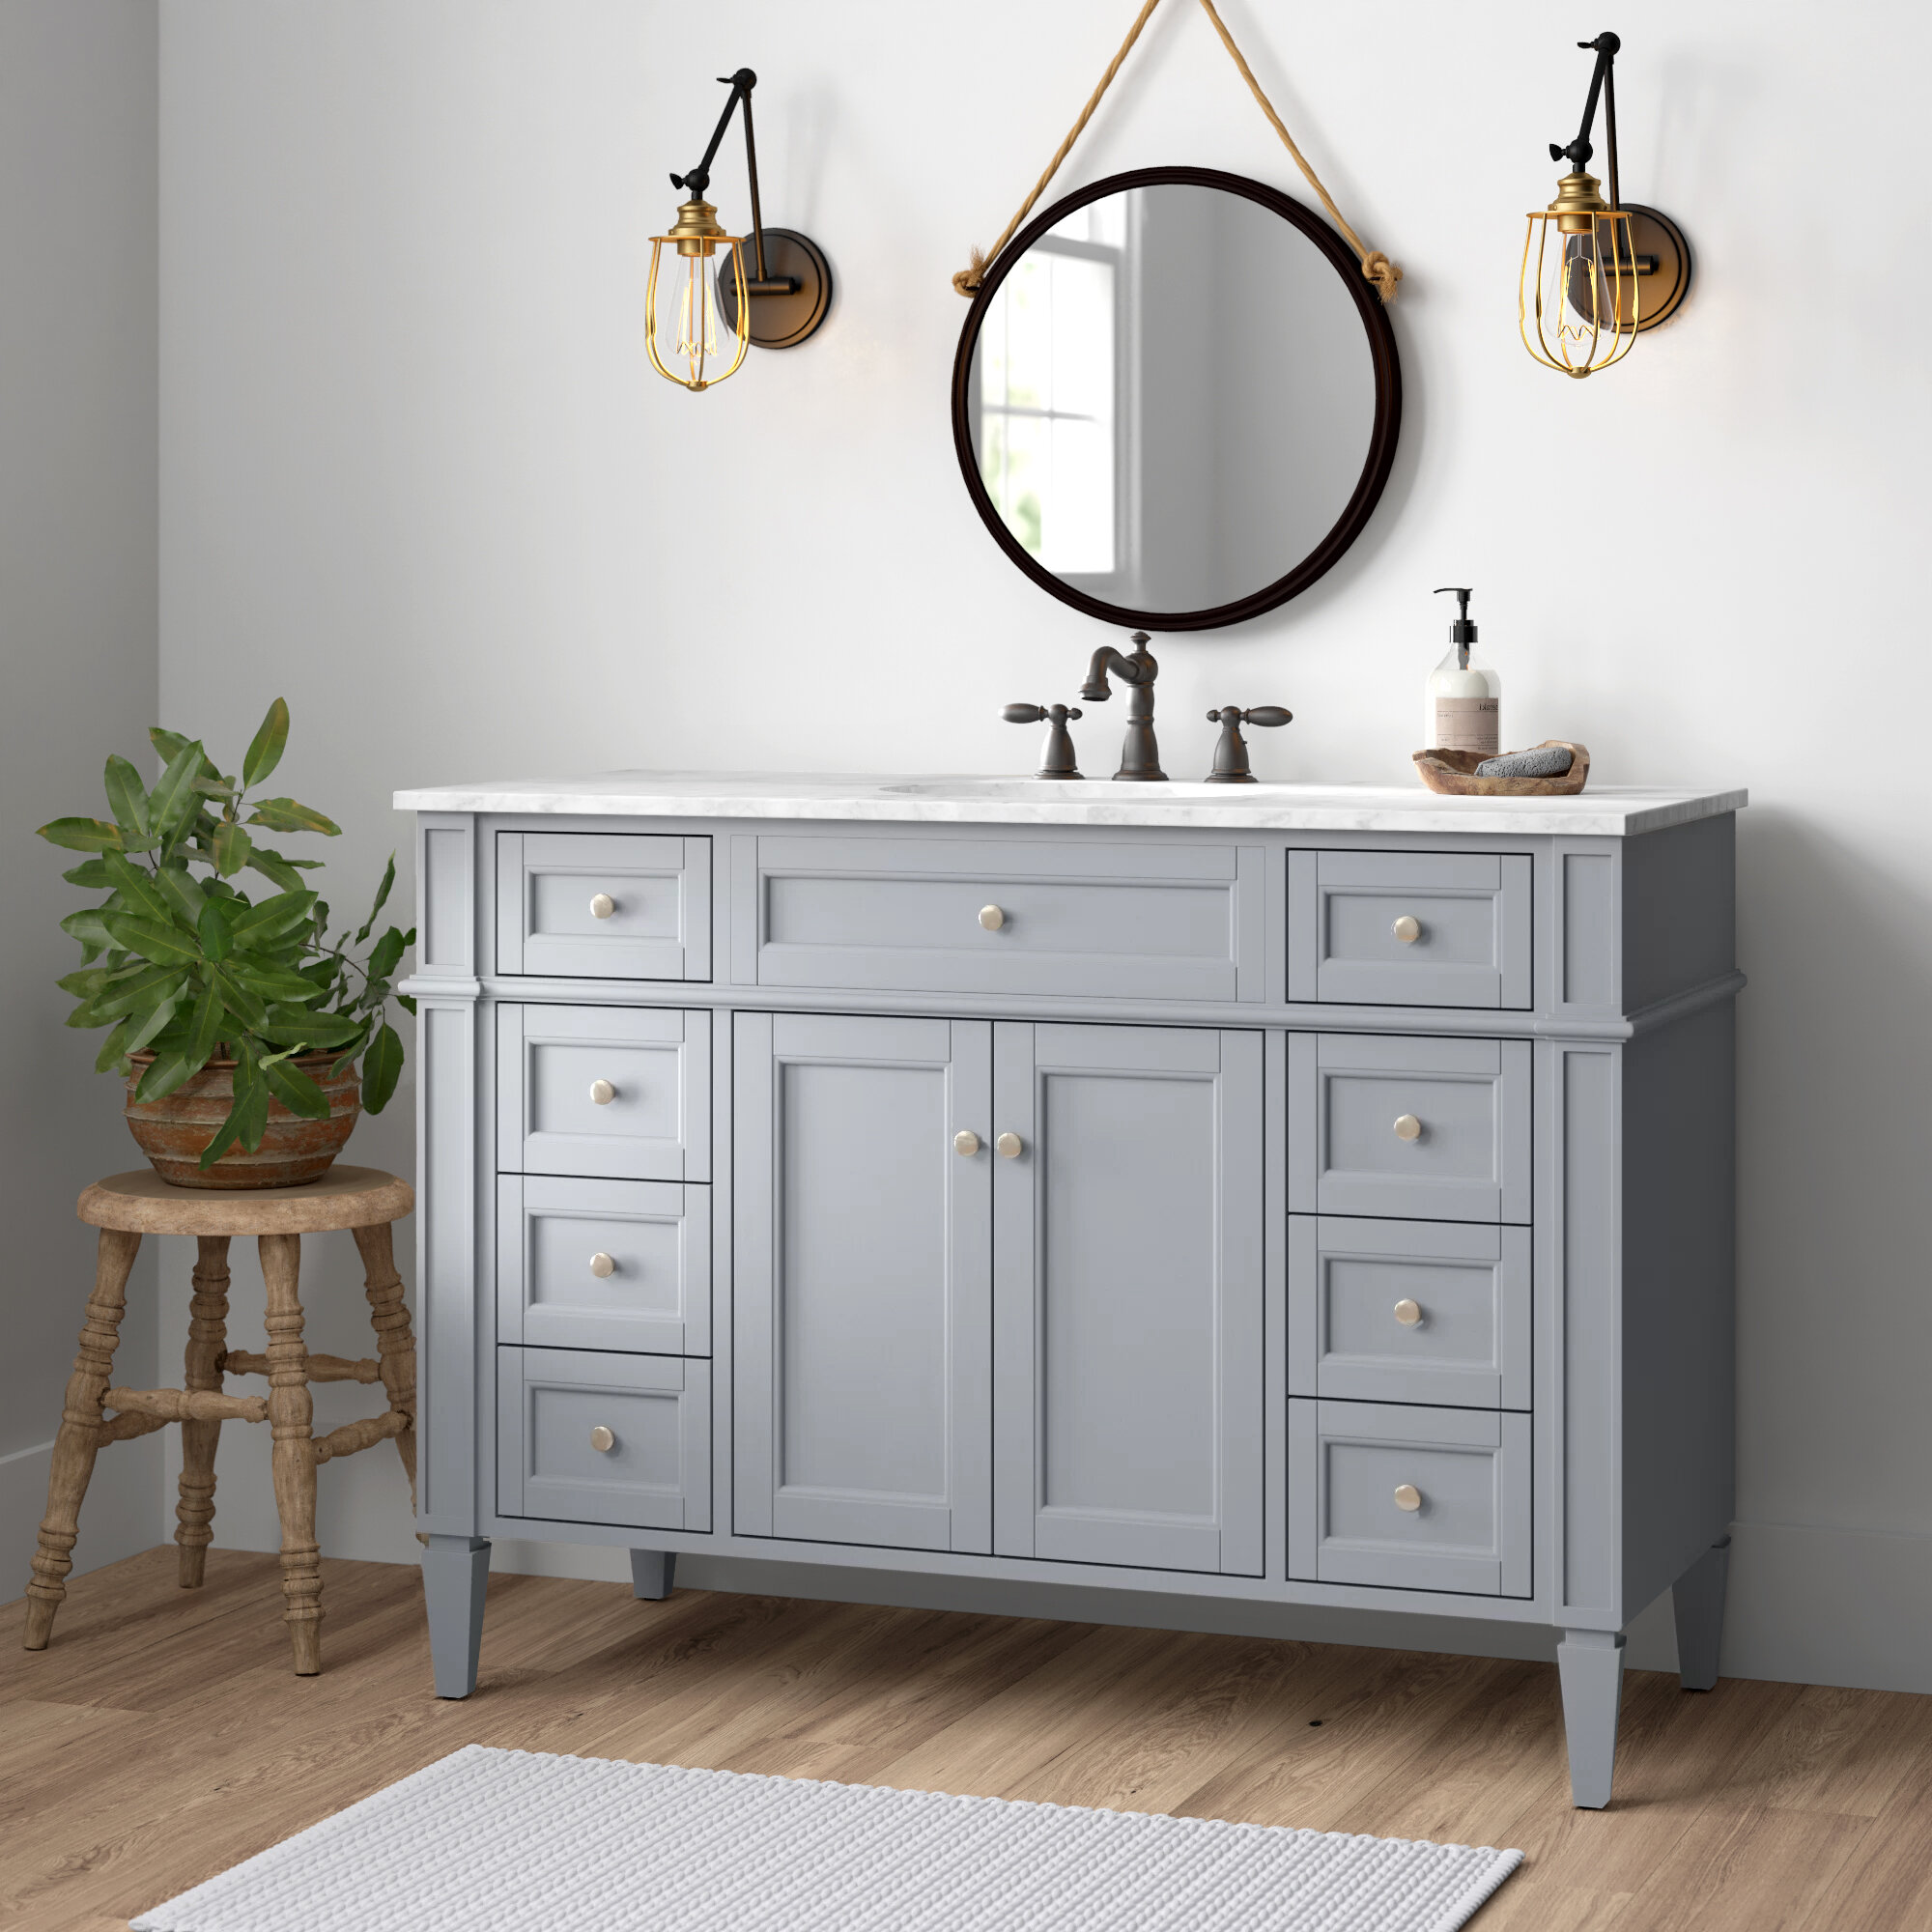 Gray Master Bathroom 48 Inch Vanities You Ll Love In 2021 Wayfair